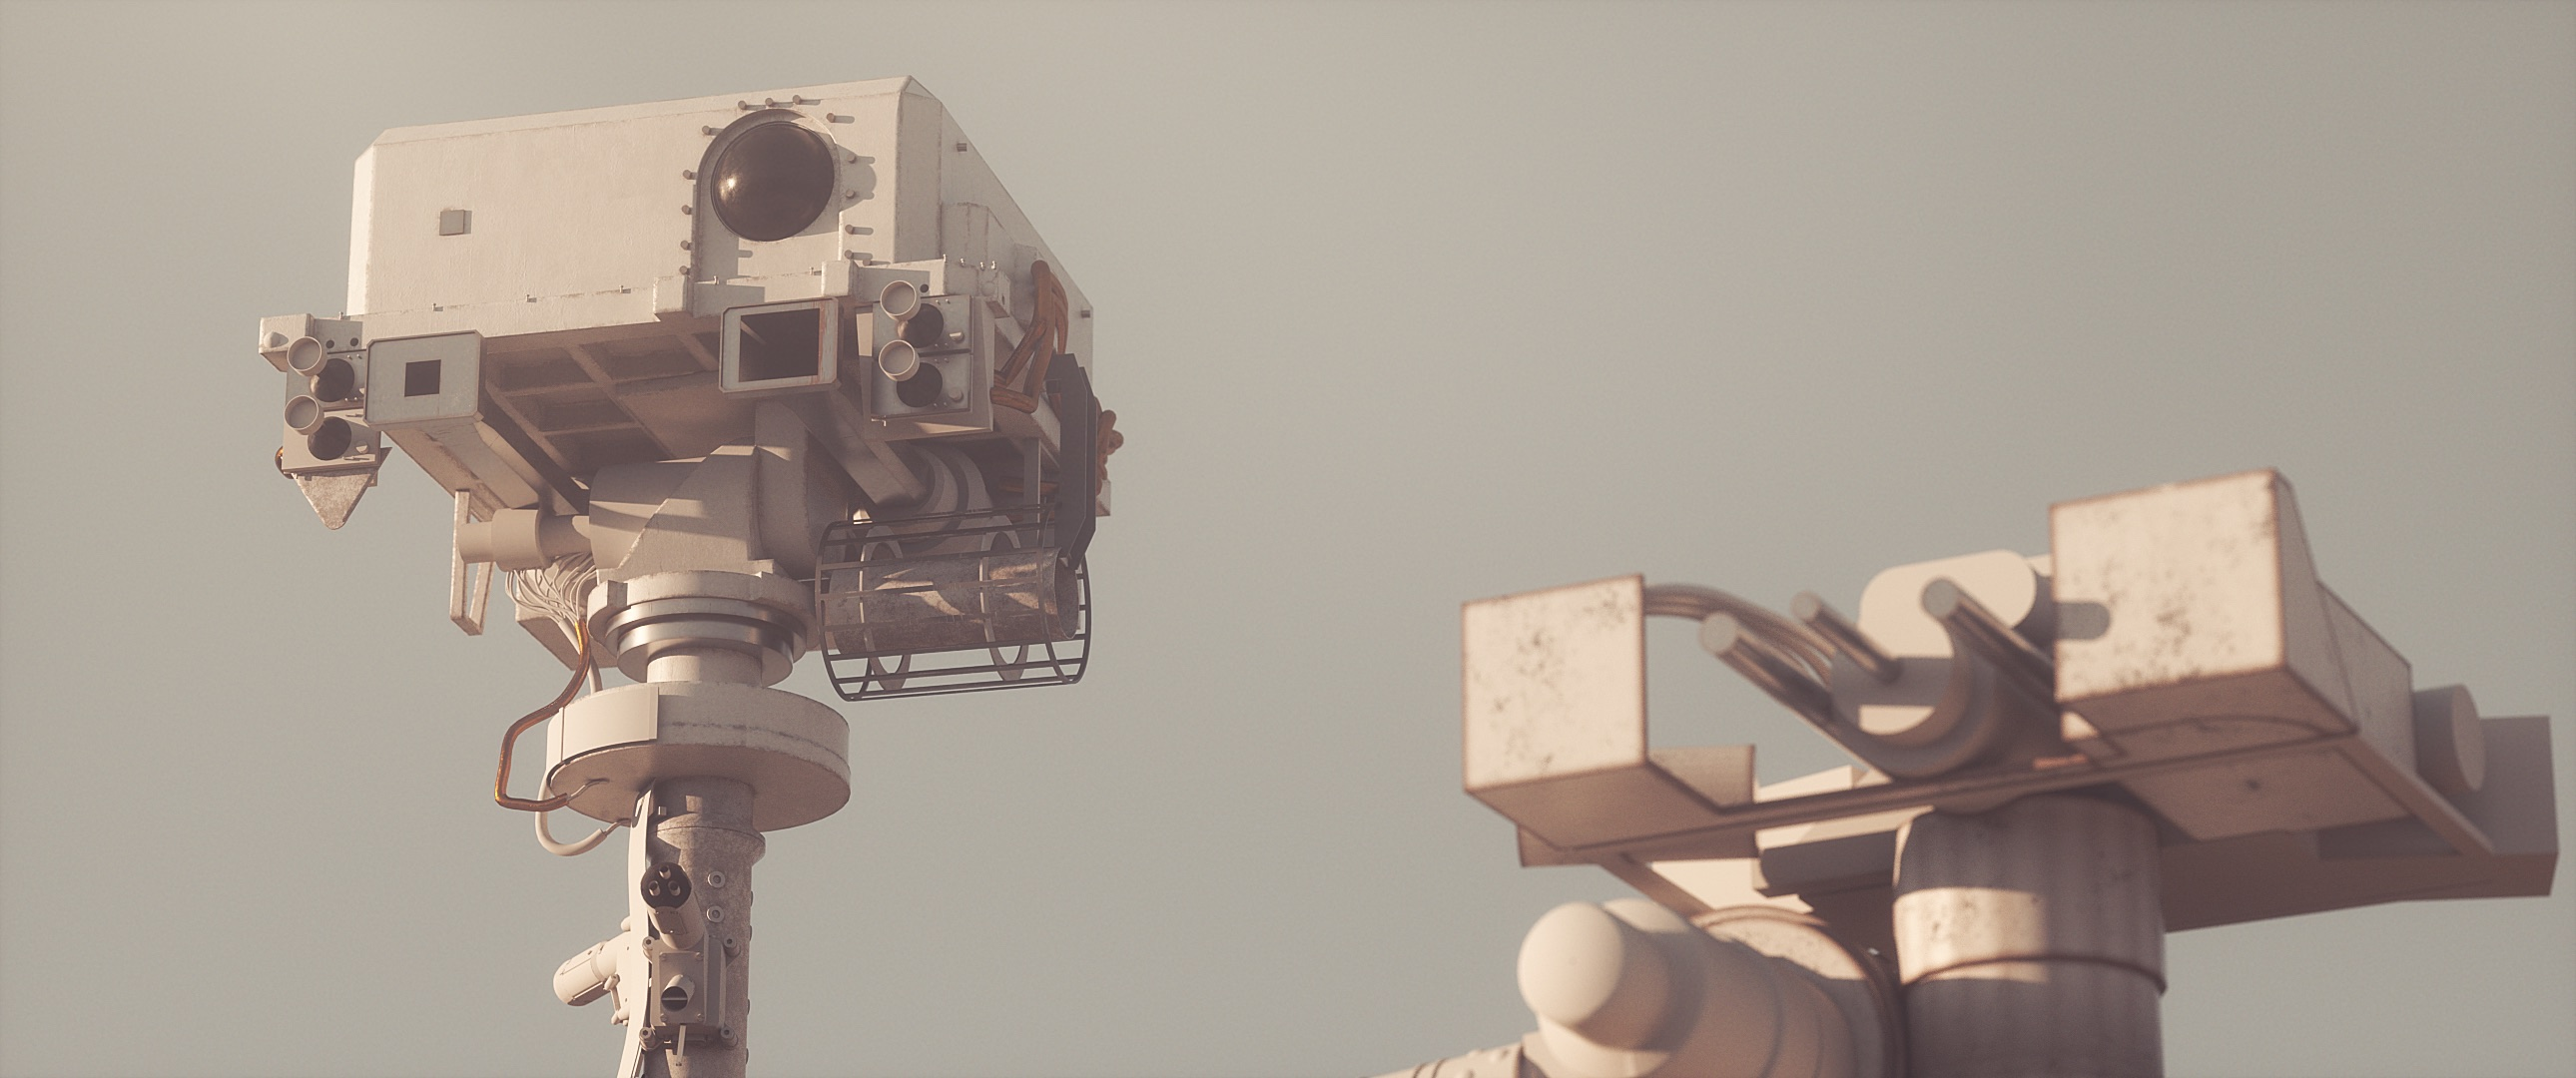 rover-1-00005.jpg